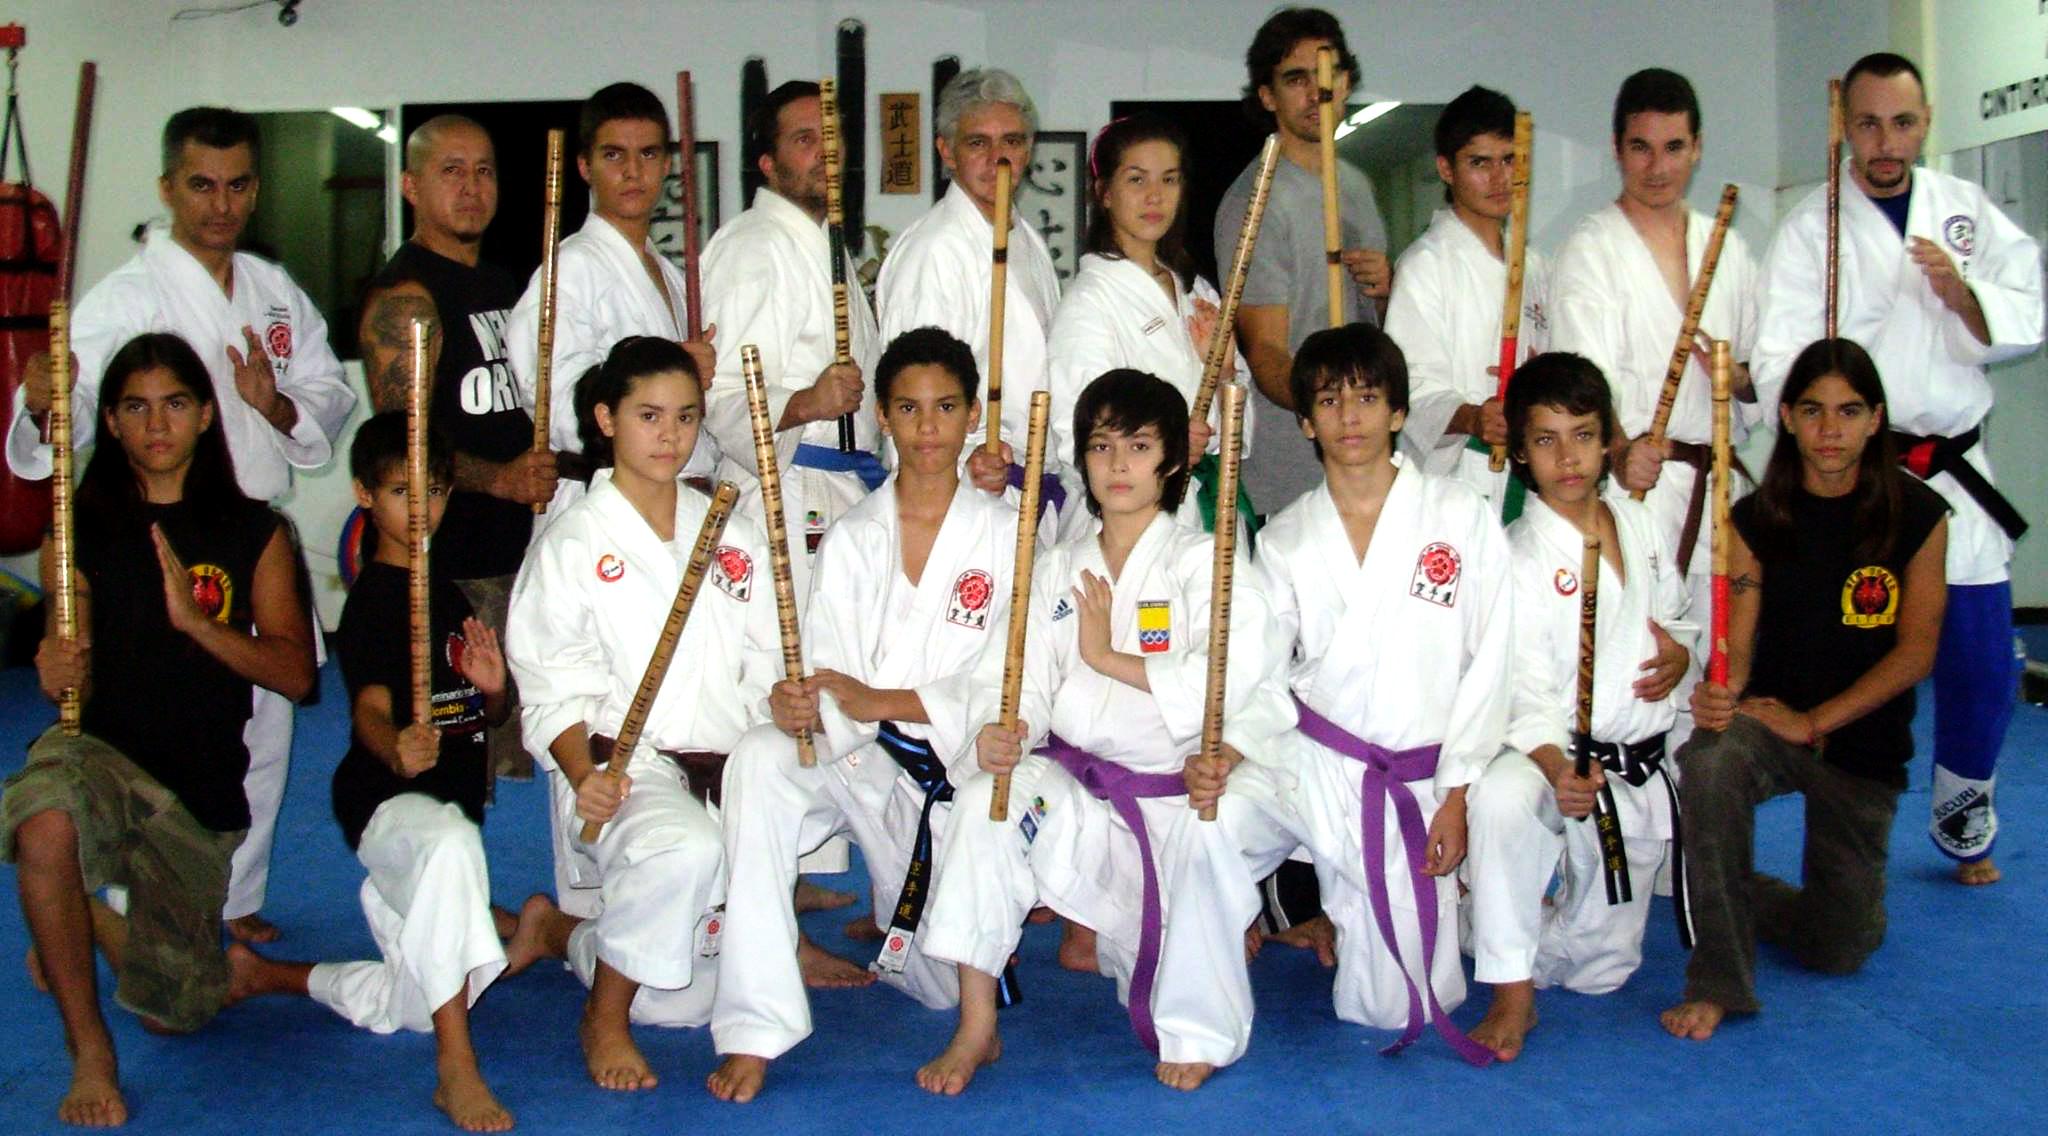 Guro Ormaza introduced Cuentada Balintawak to South America via a seminar in Cali, Columbia in 2009